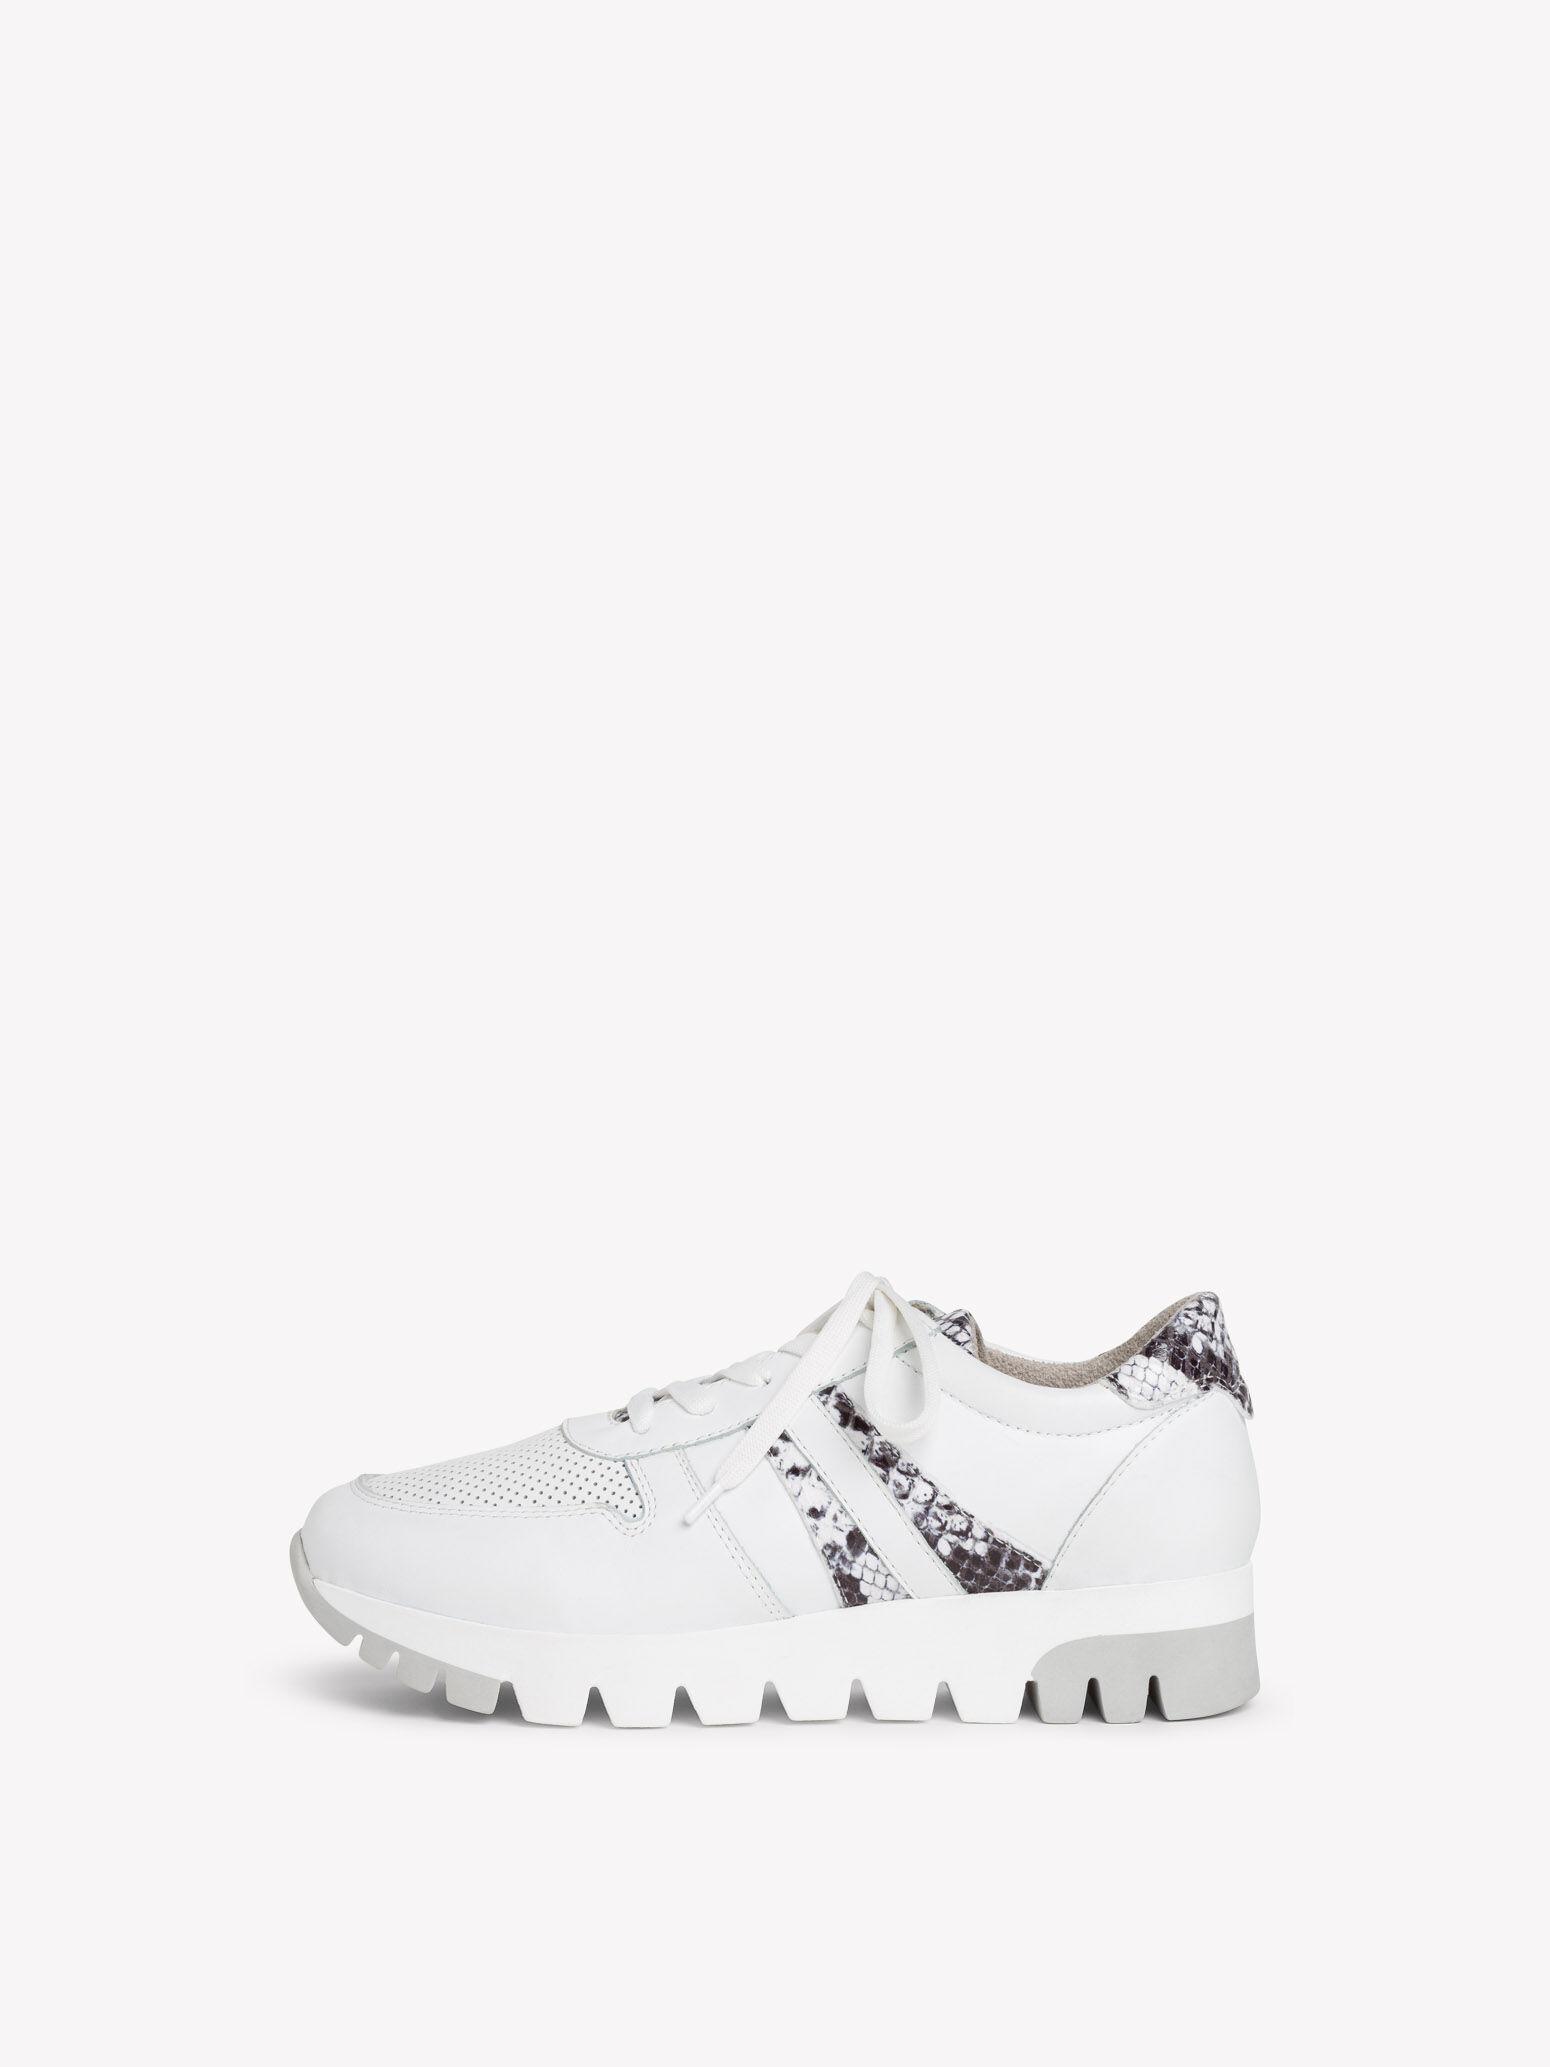 Tamaris Leder Sneaker hier kaufen I ABOUT YOU